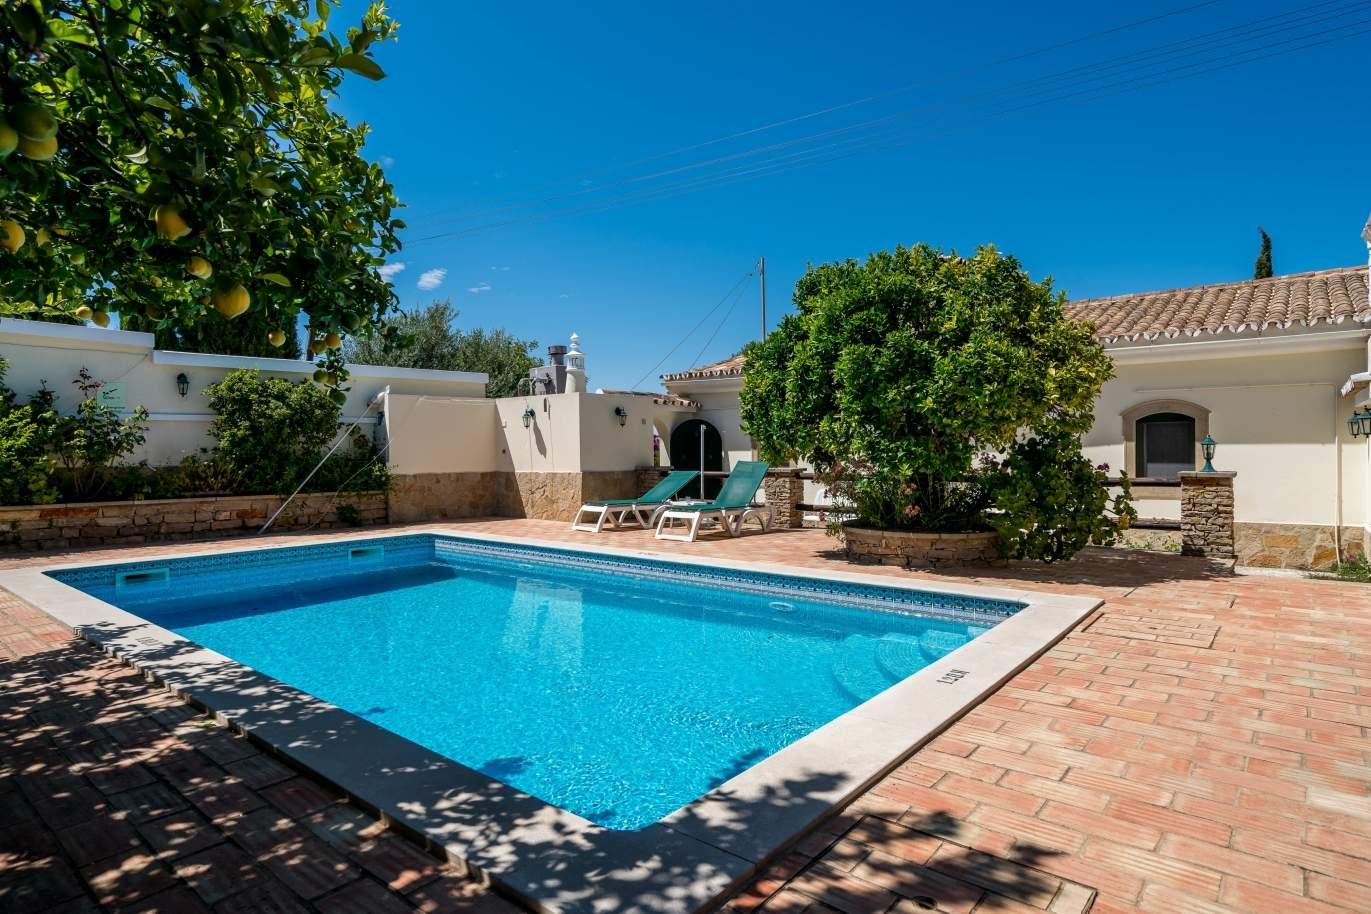 verkauf-villa-mit-pool-in-sao-bras-de-alportel-algarve-portugal